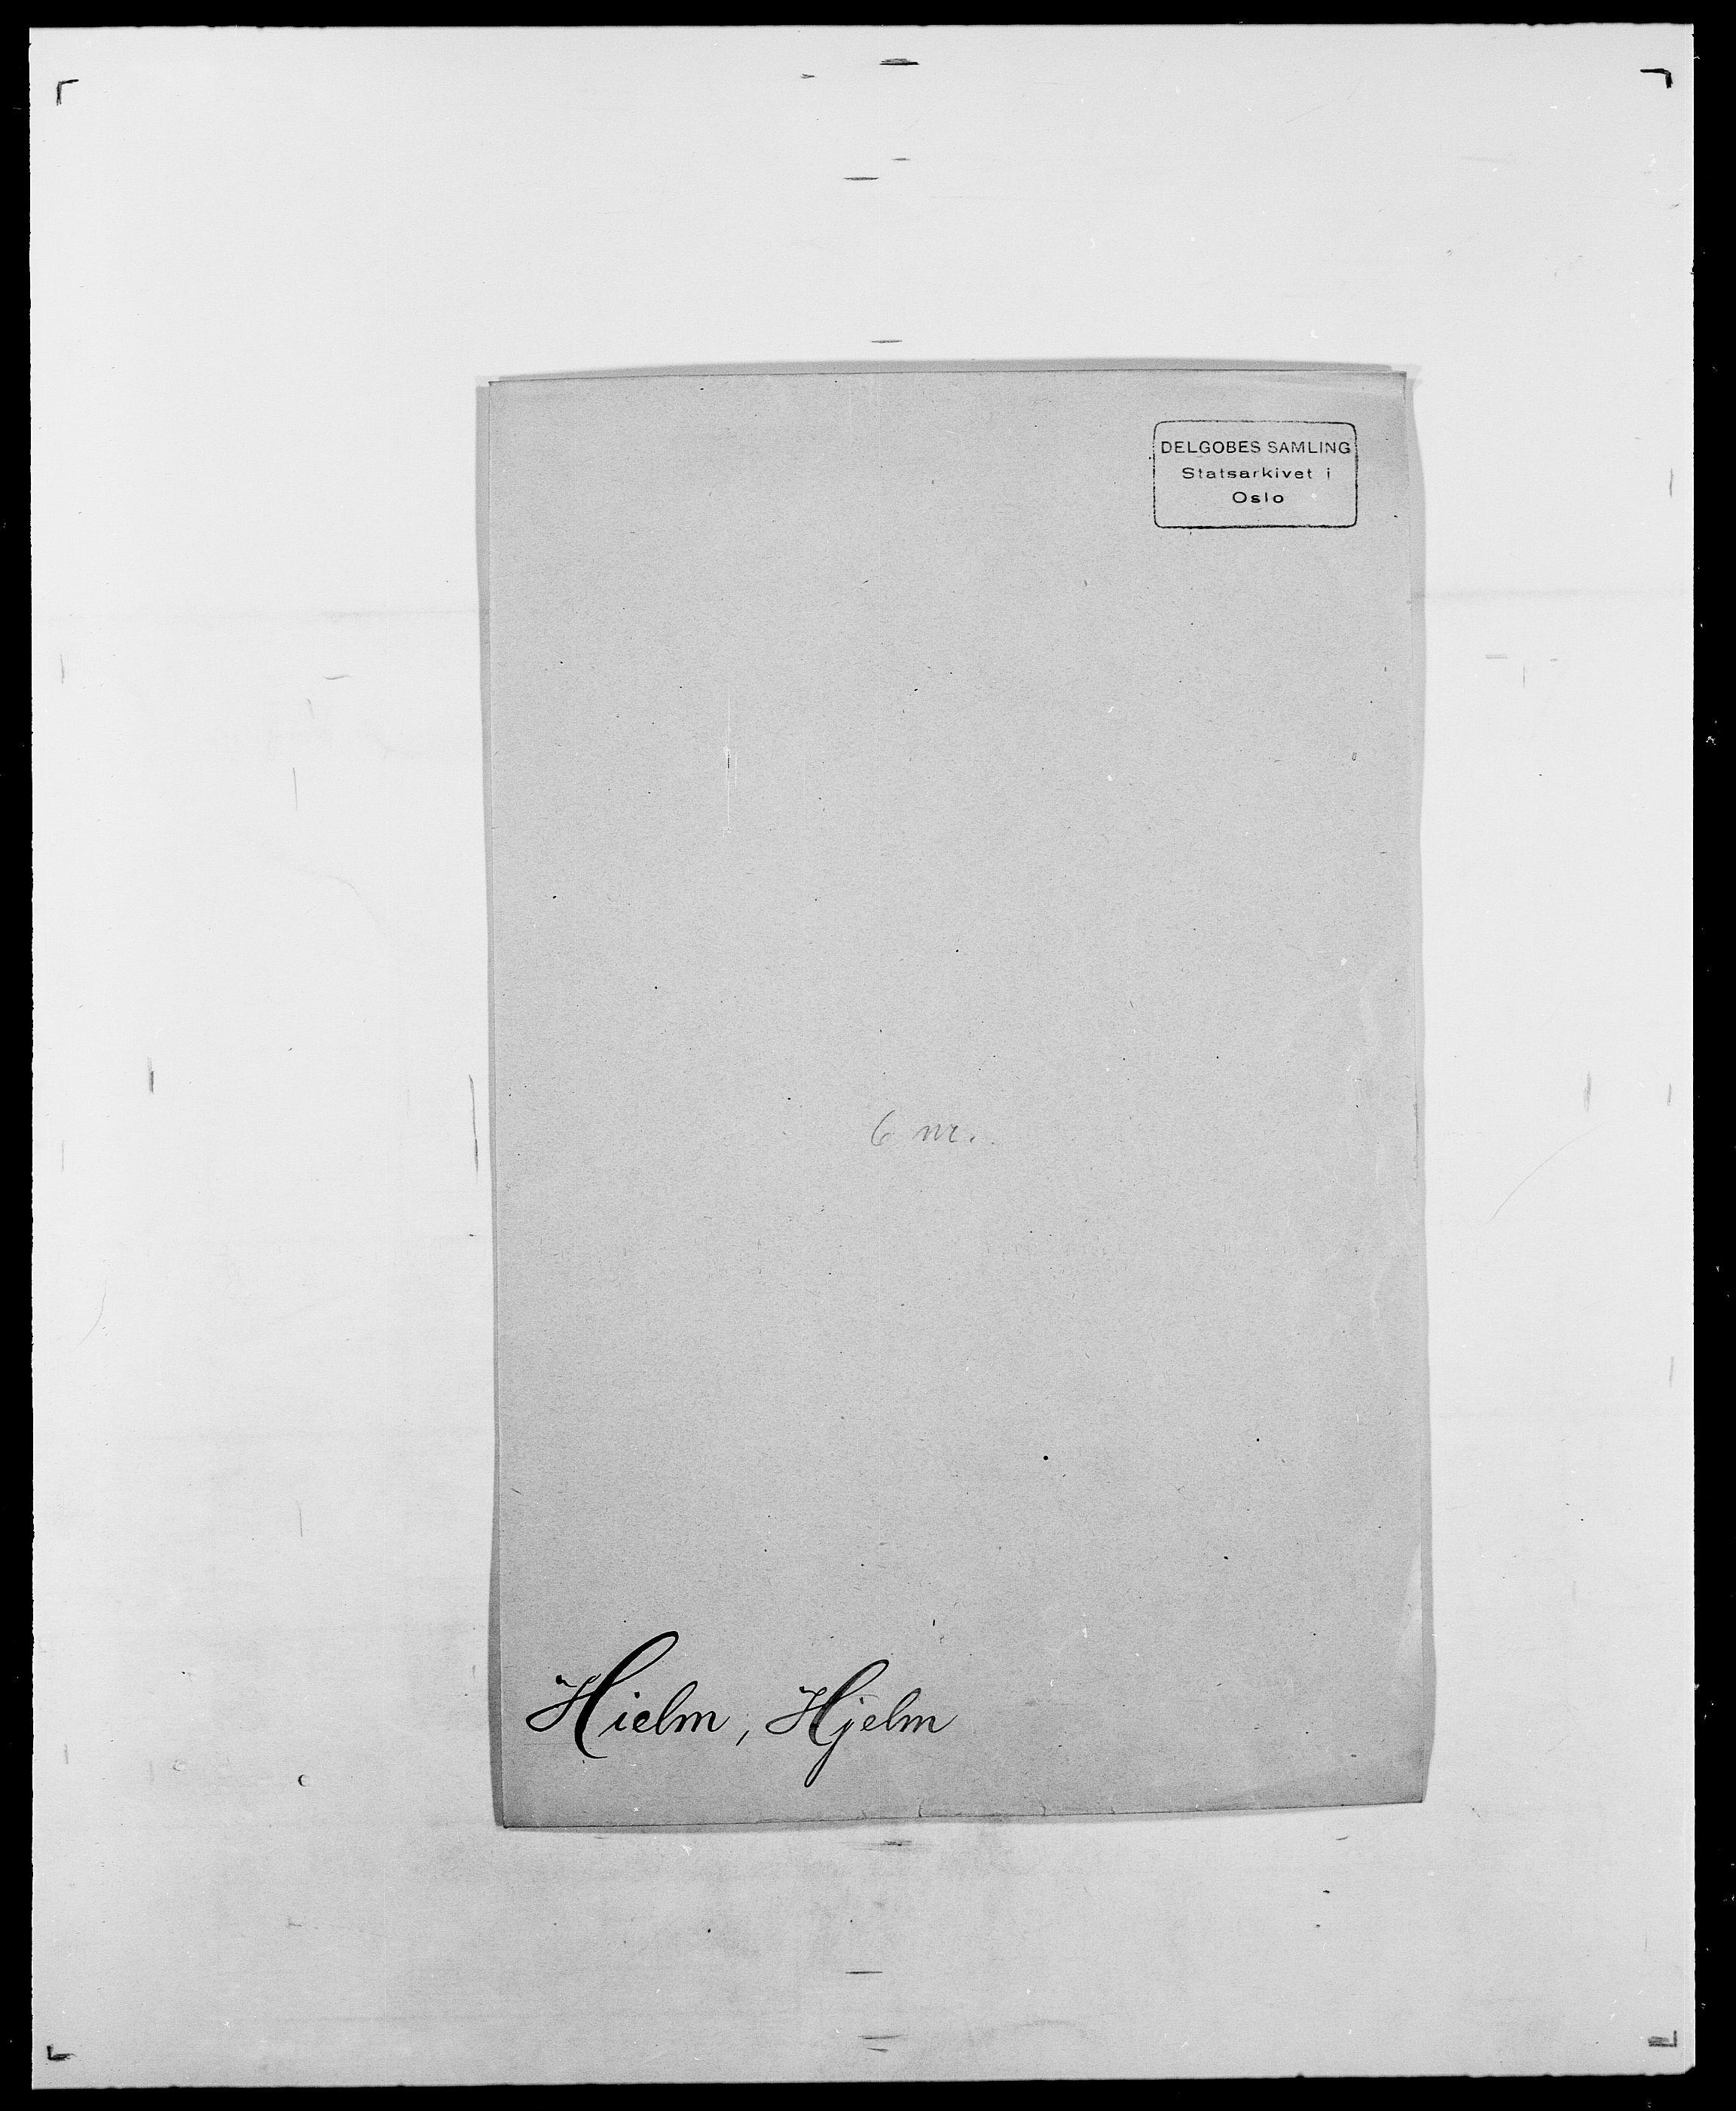 SAO, Delgobe, Charles Antoine - samling, D/Da/L0017: Helander - Hjørne, s. 406